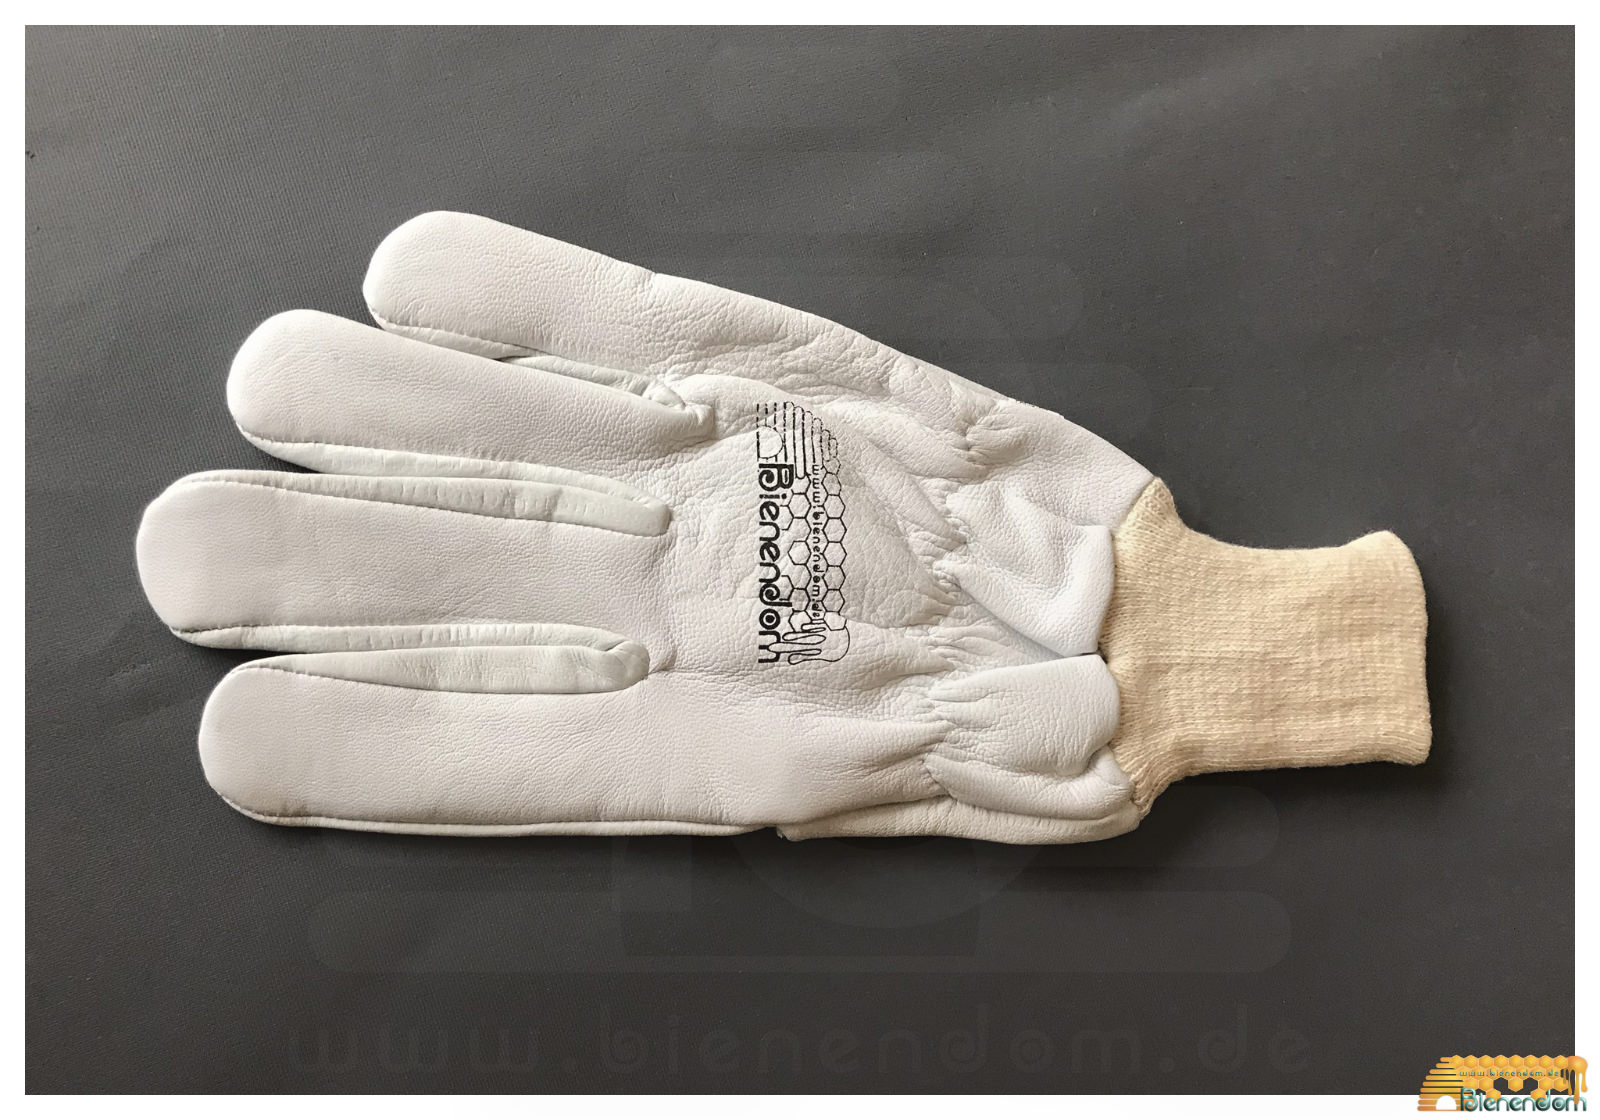 Imkerhandschuh aus Leder kurz